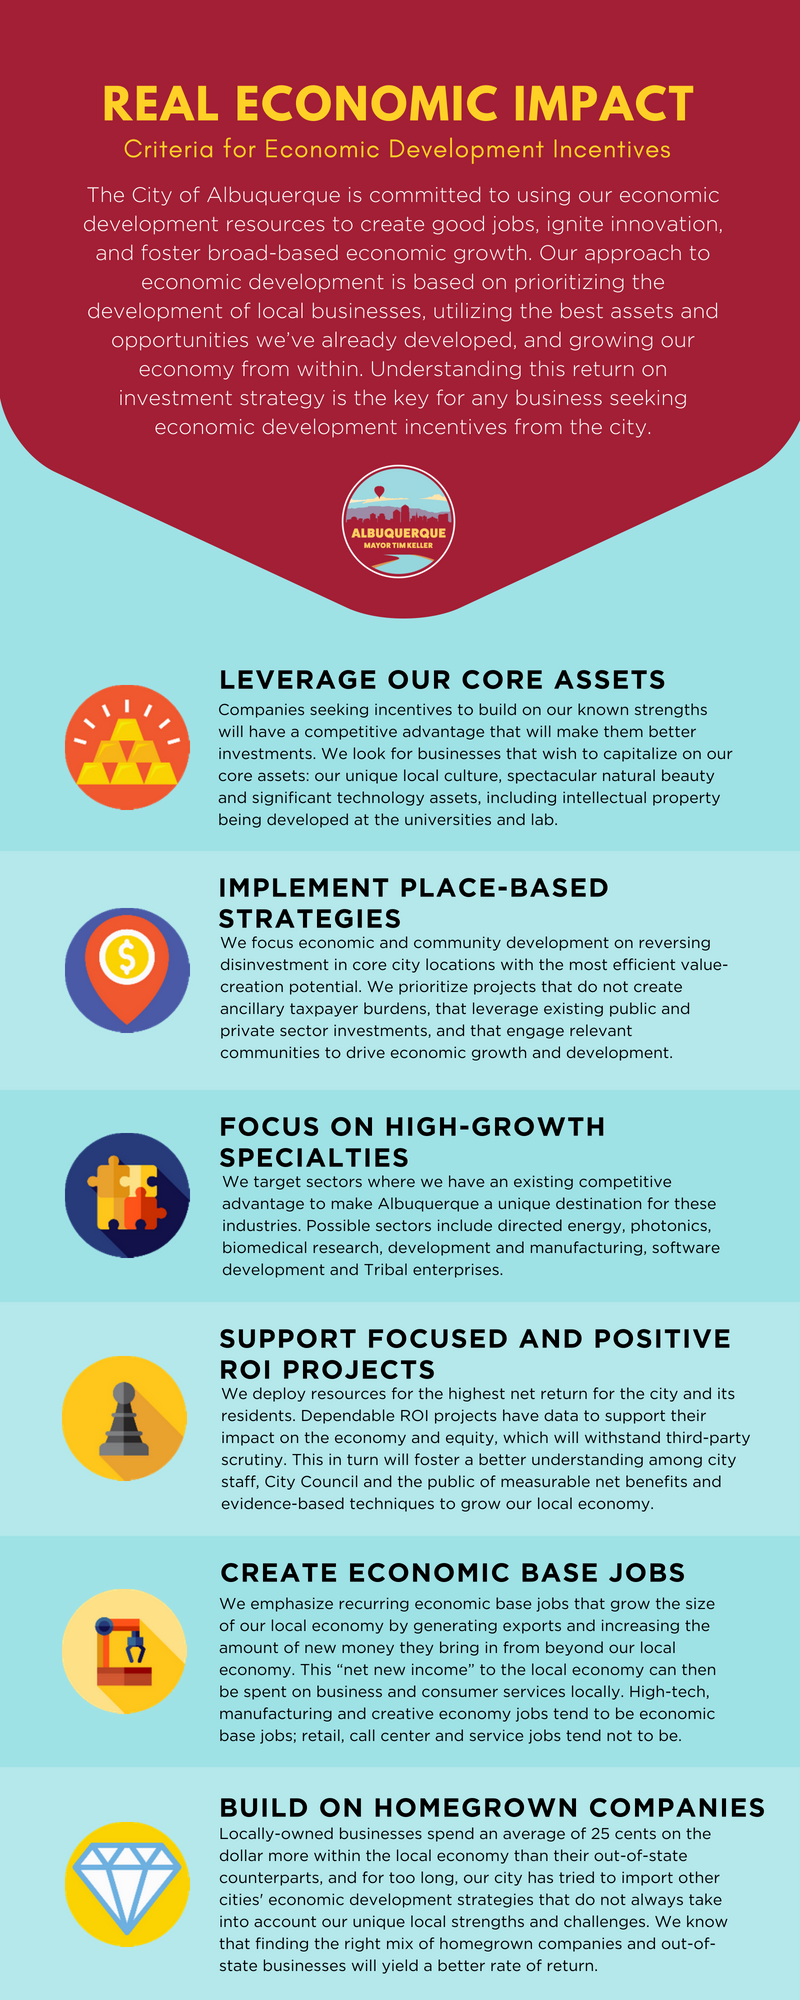 Infographic: criteria for economic development incentives